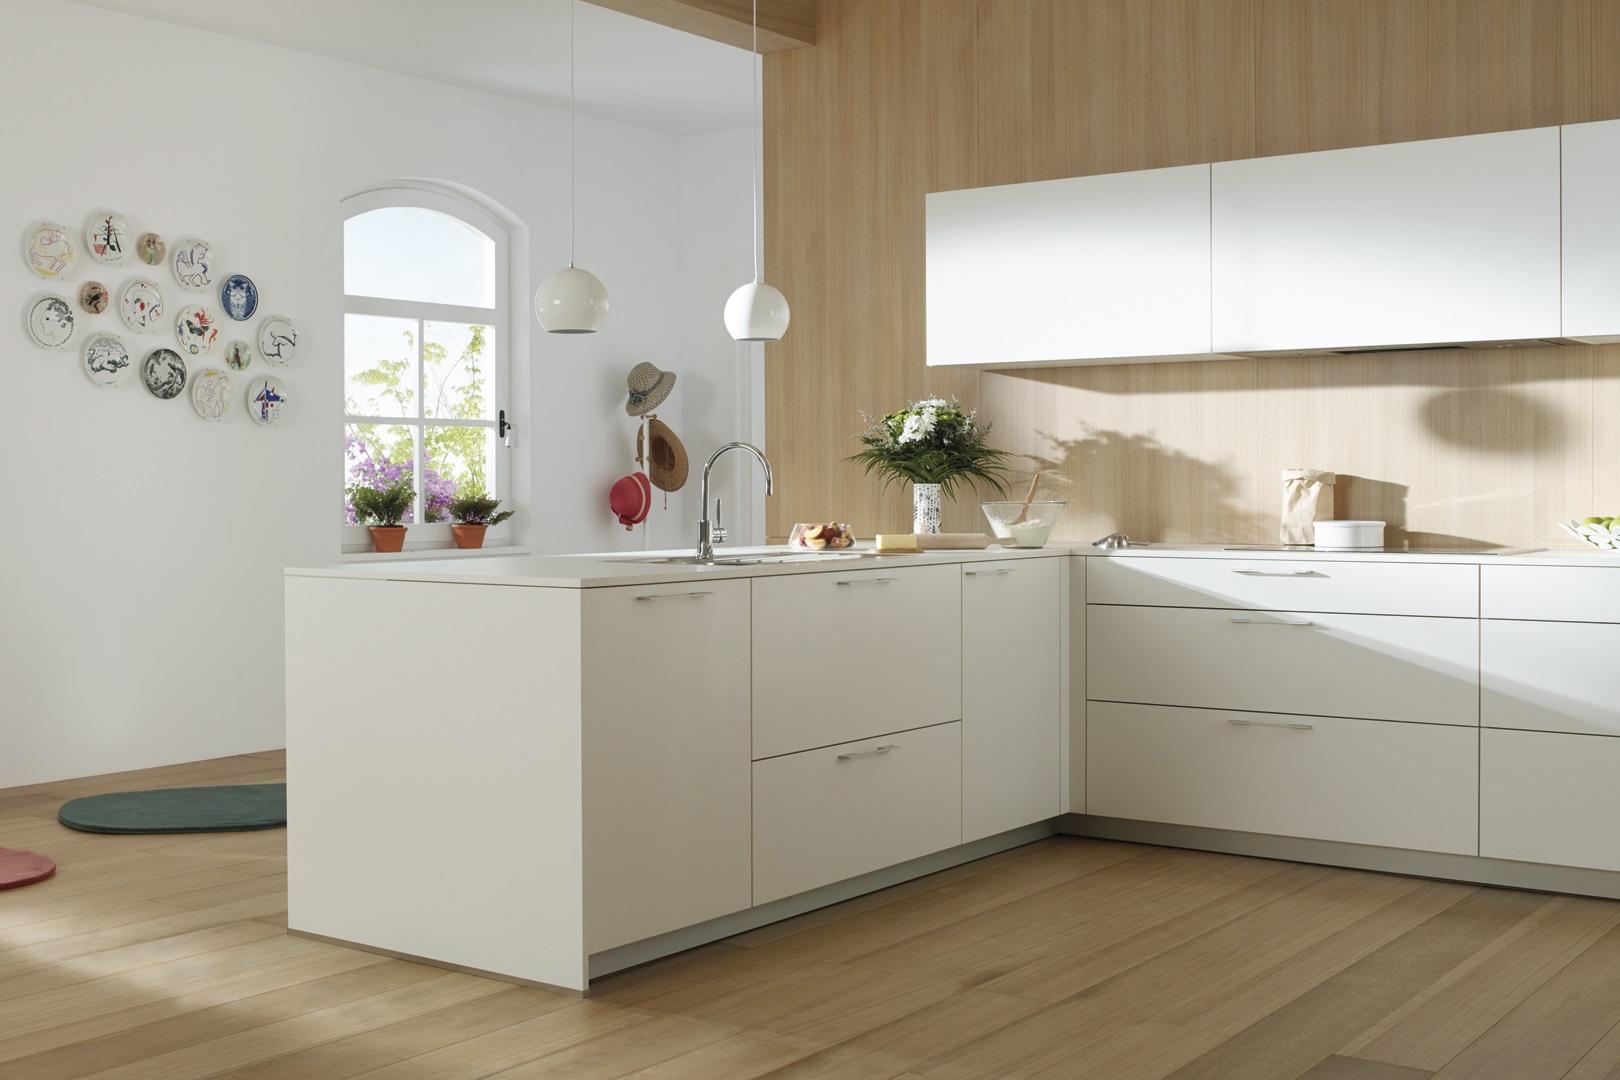 14 Ideas de Cocinas Blancas para Inspirarte | Santiago ...